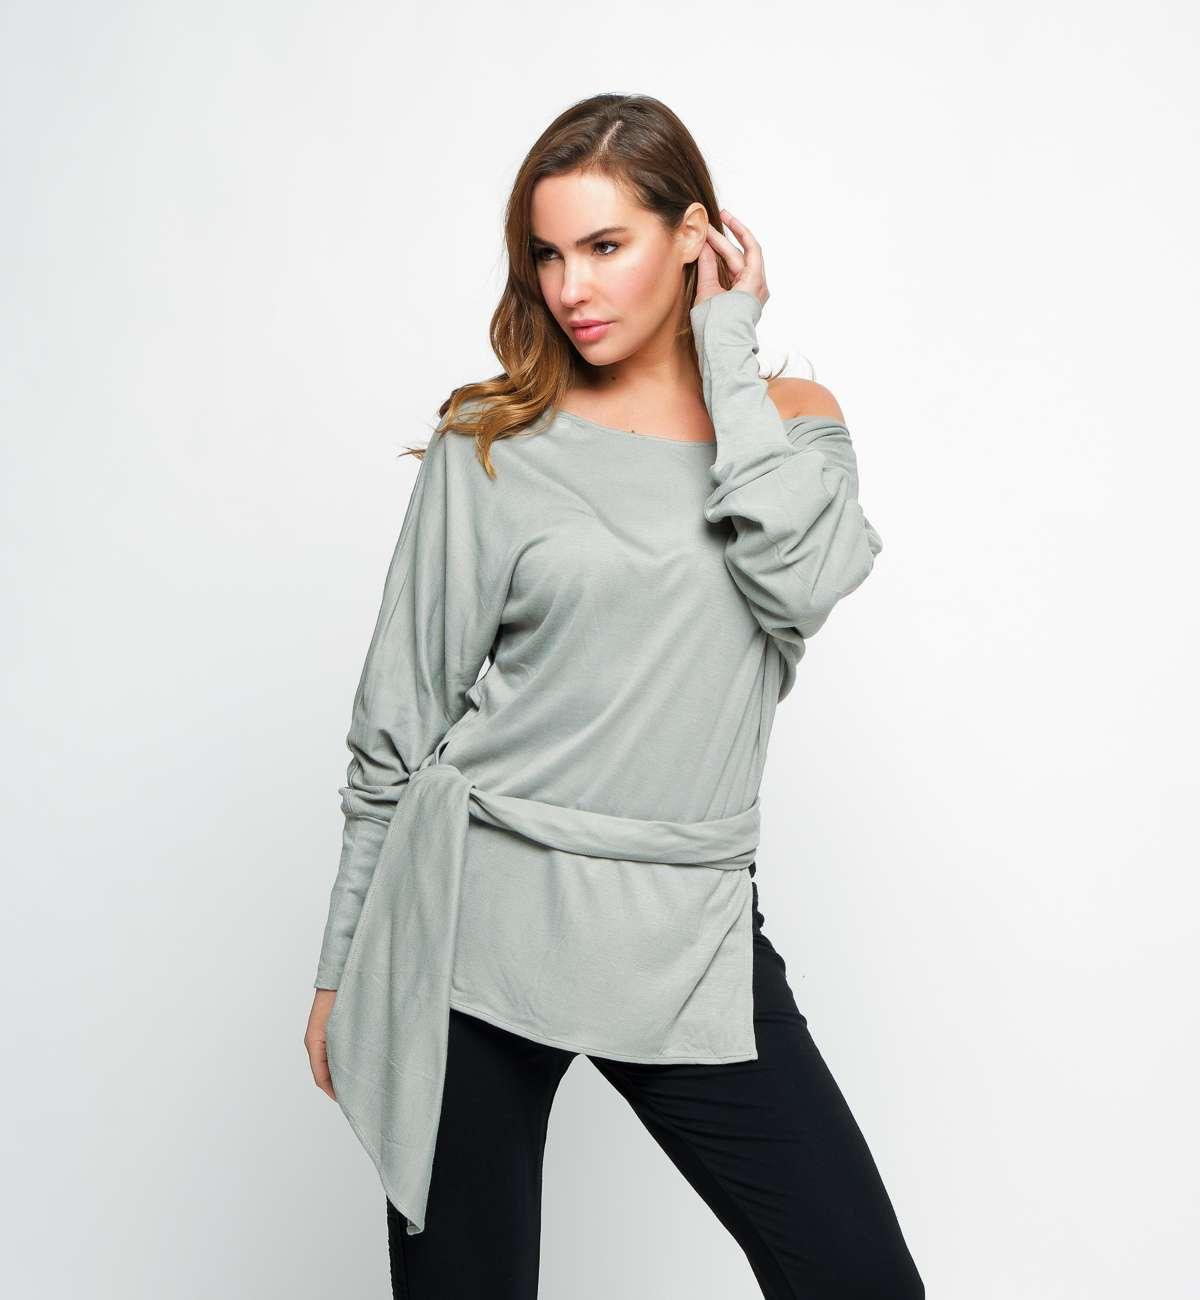 T-shirt Bambou ML épaule nue Kaki clair